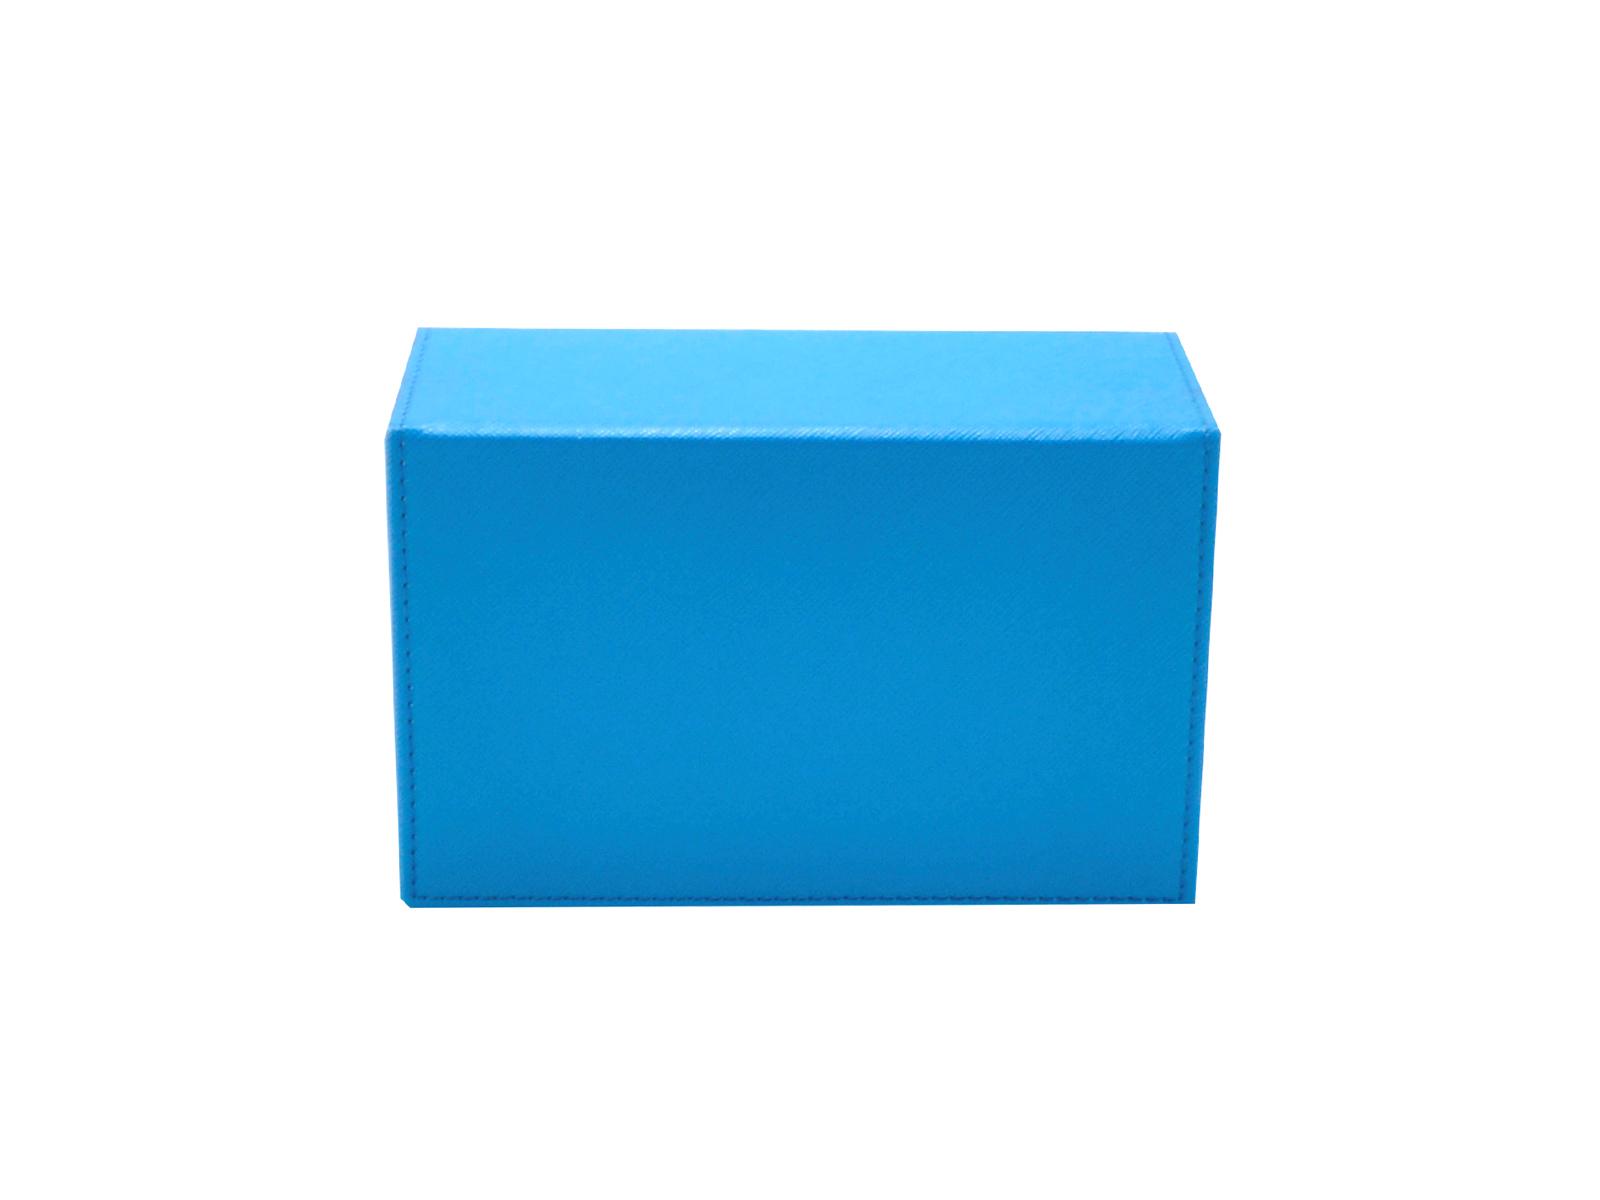 Dex Protection - The Dualist Deckbox -  Blue